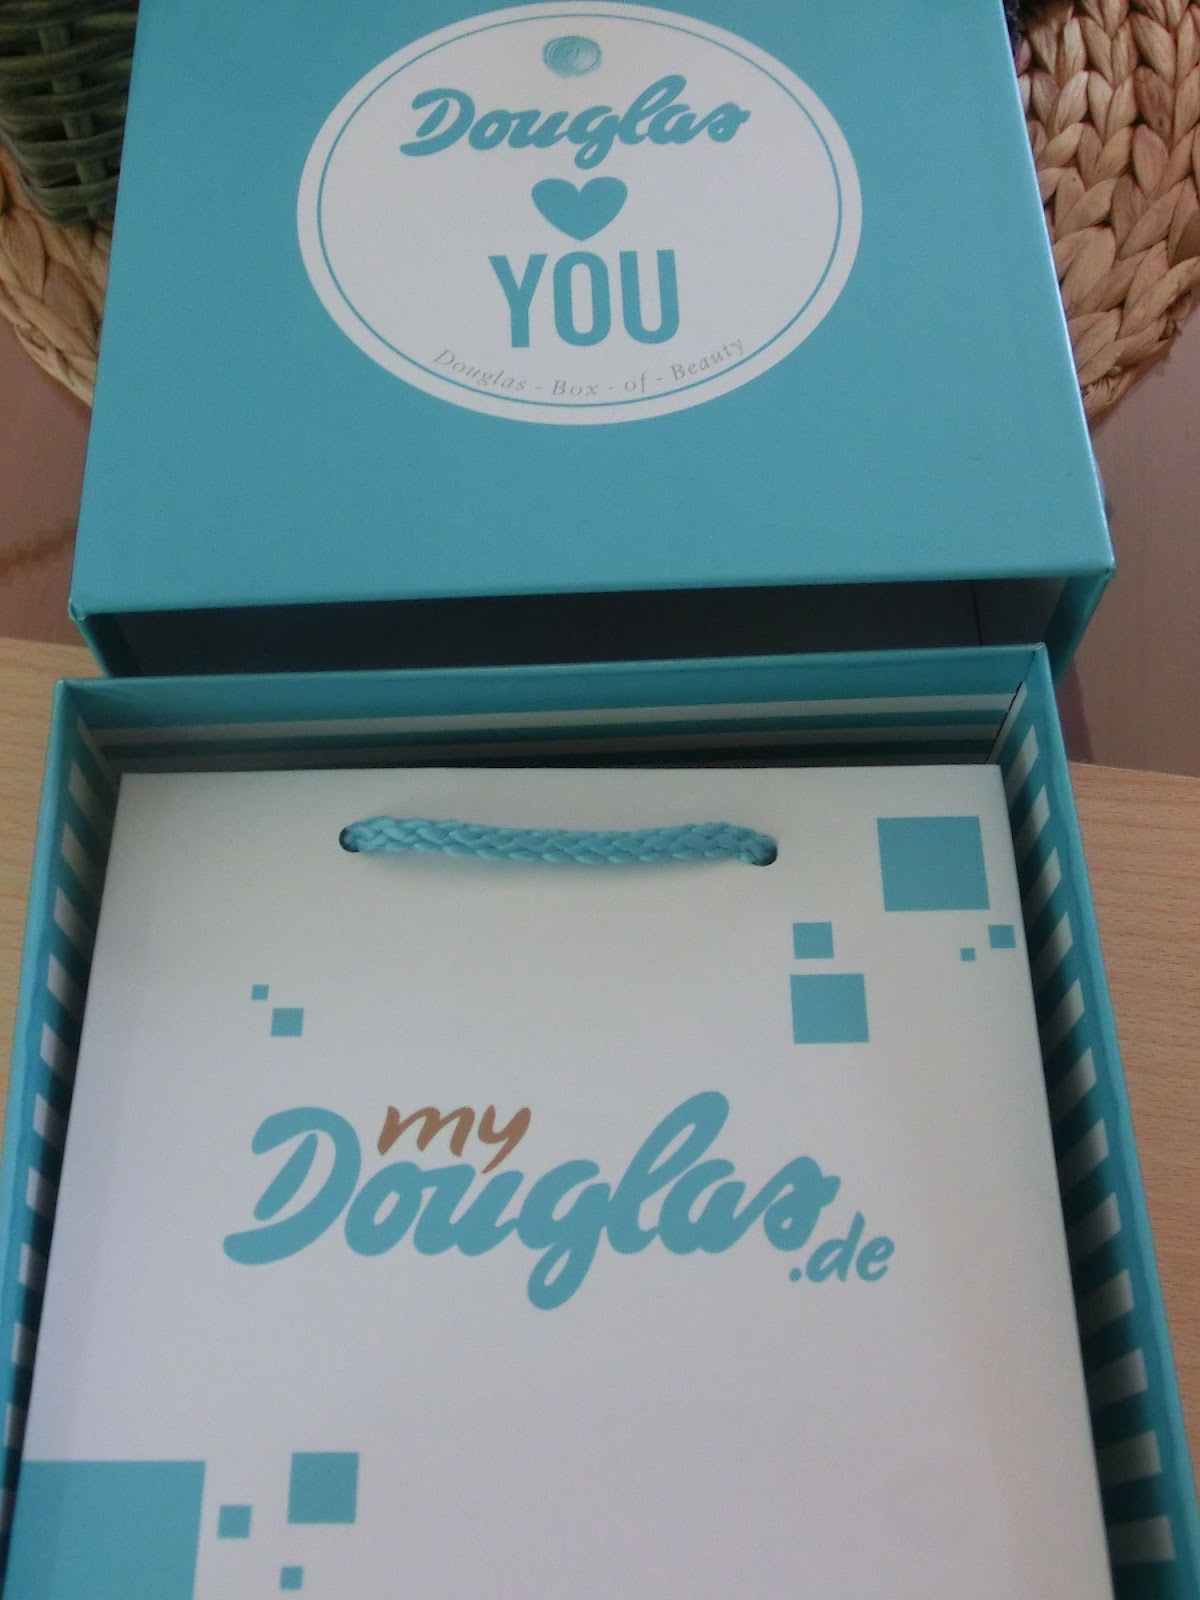 ae67e98b5 elassunnyside: Douglas Box of Beauty Juni